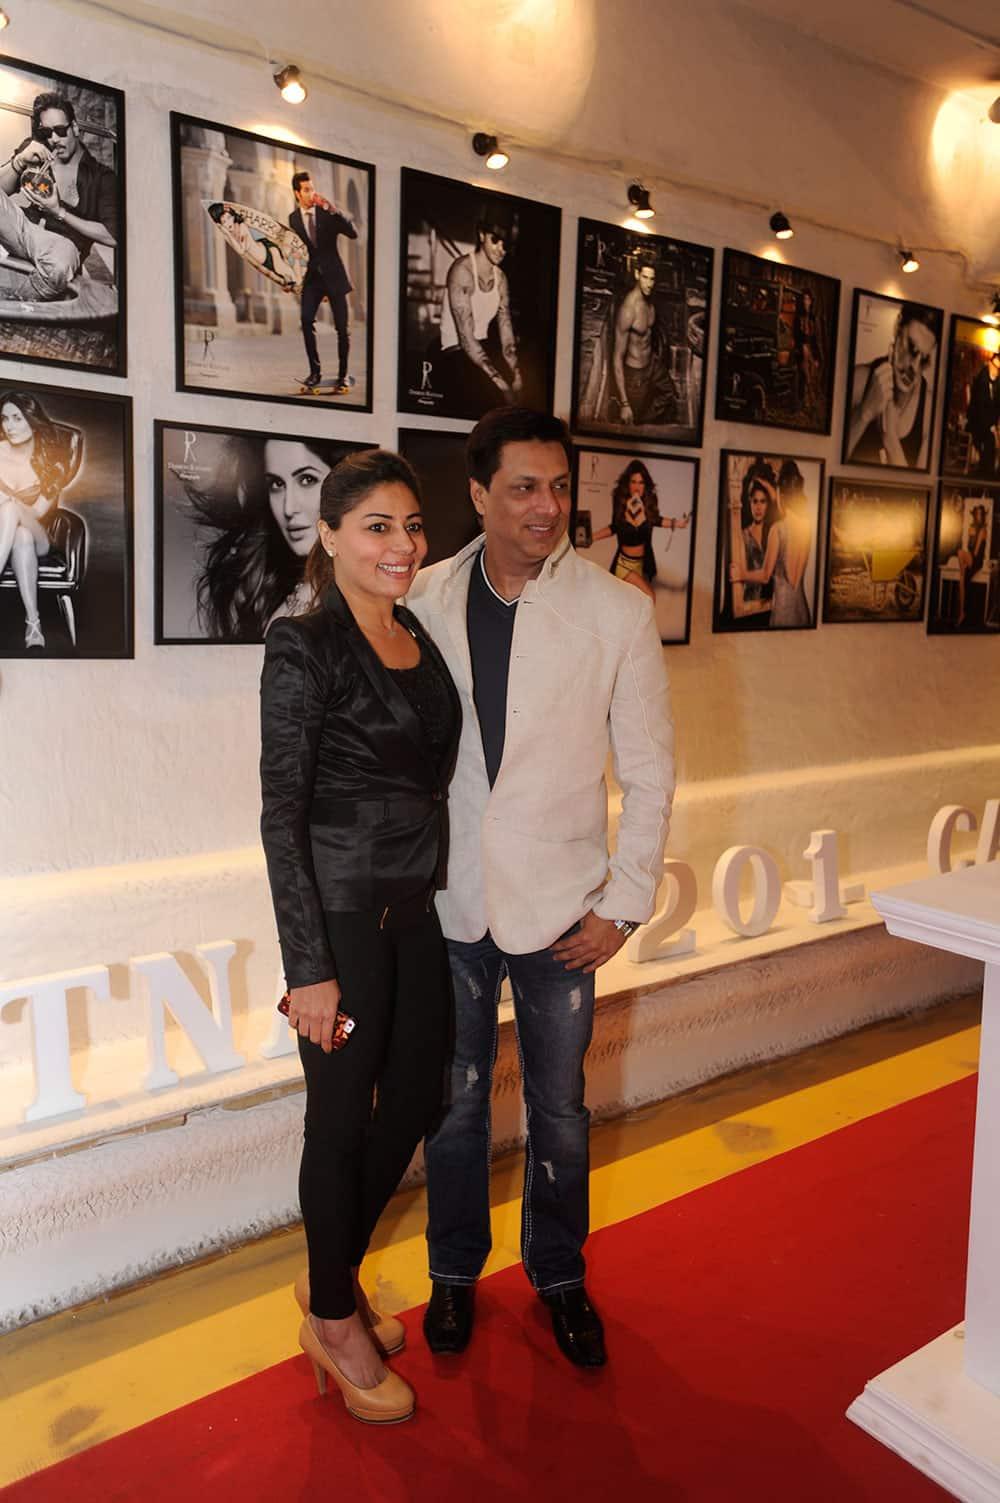 Renu Bhandarkar (L) and Madhur Bhandarkar (R) during the launch of Dabboo Ratnani's calendar 2014 at Olive, Bandra in Mumbai. Pic Courtesy: DNA